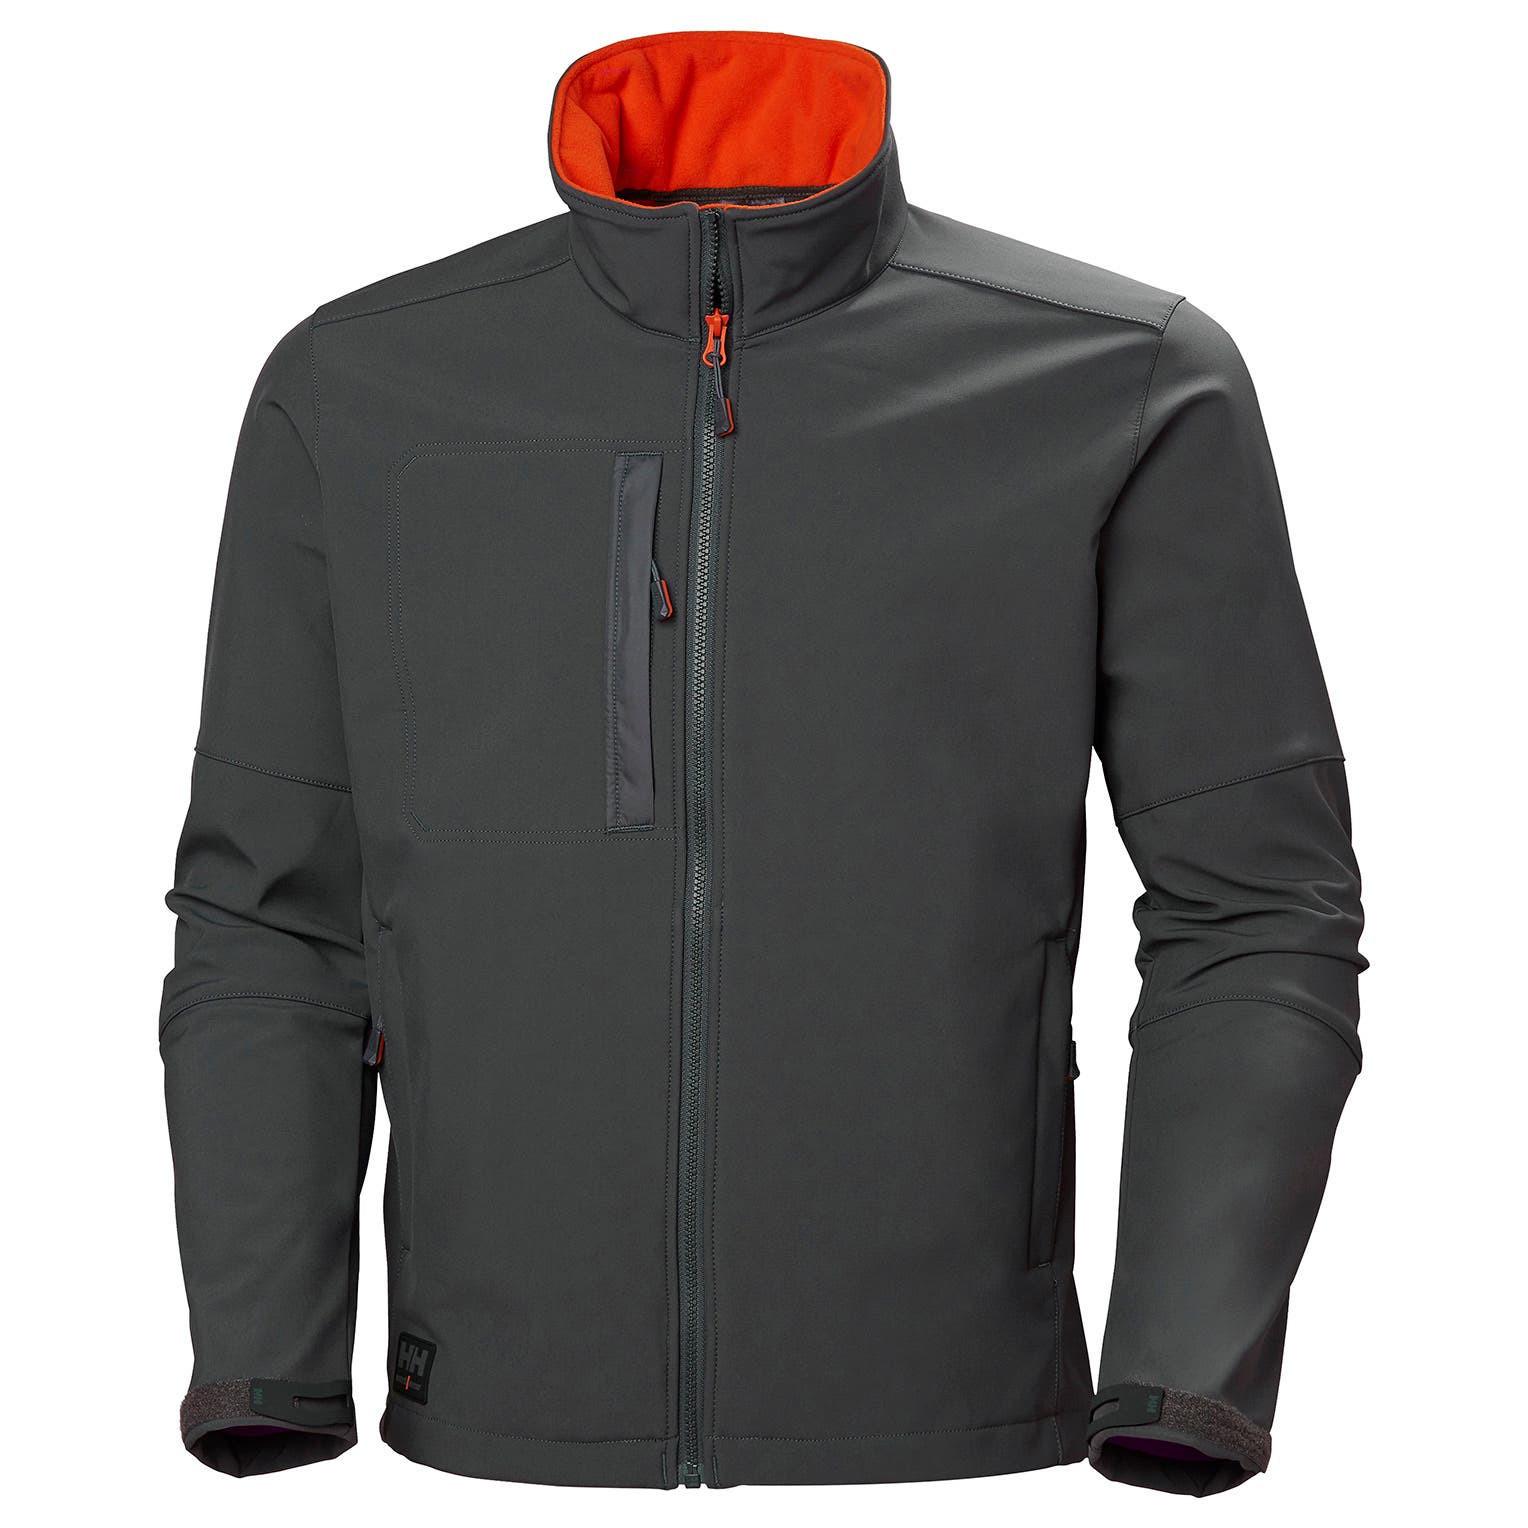 Куртка Helly Hansen Kensington Softshell Jacket - 74231 (Dark Grey)